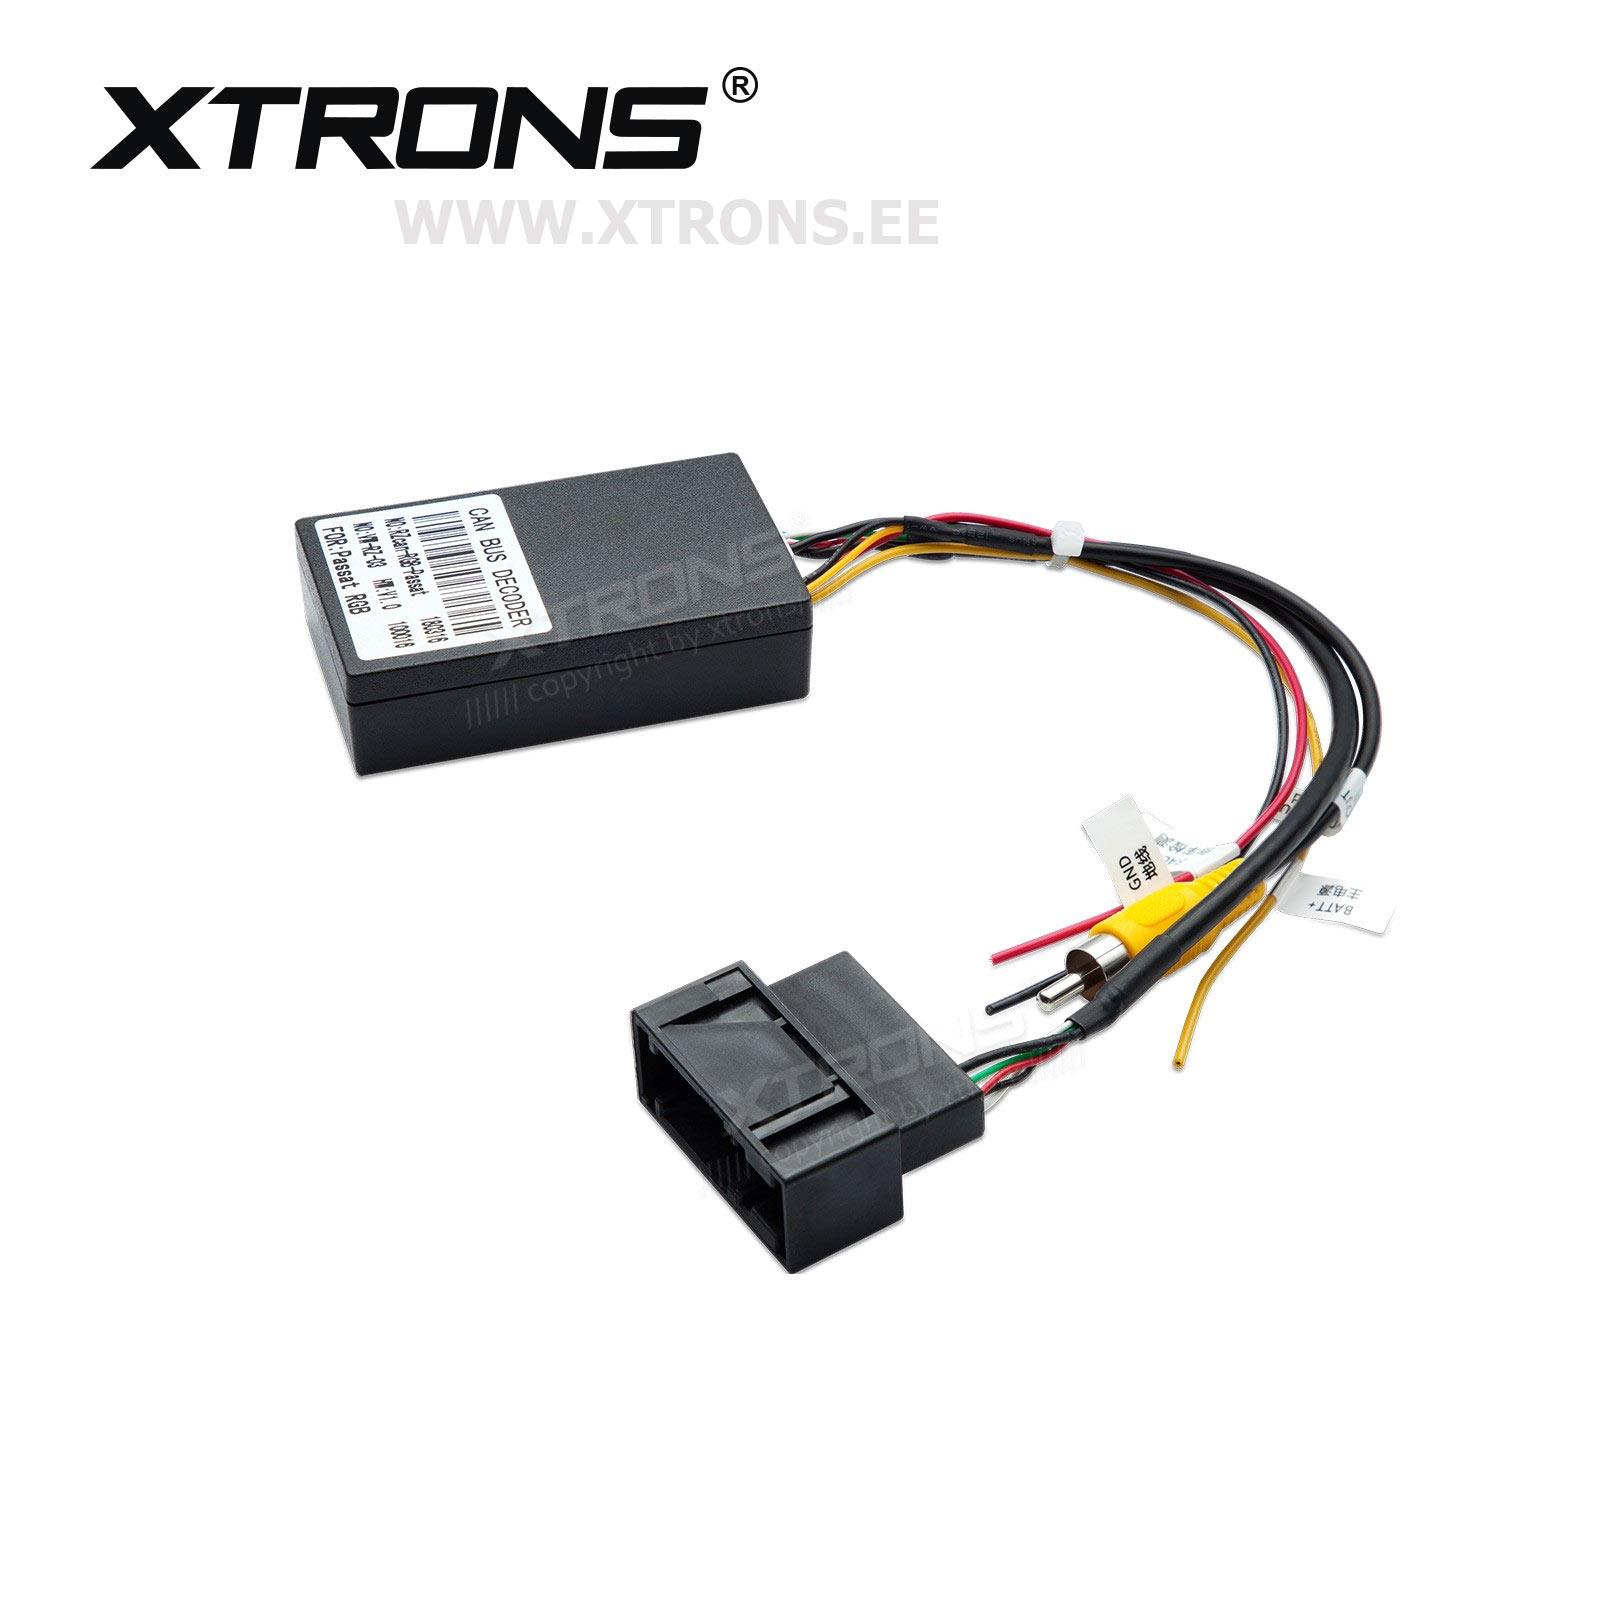 XTRONS CAMDCV01